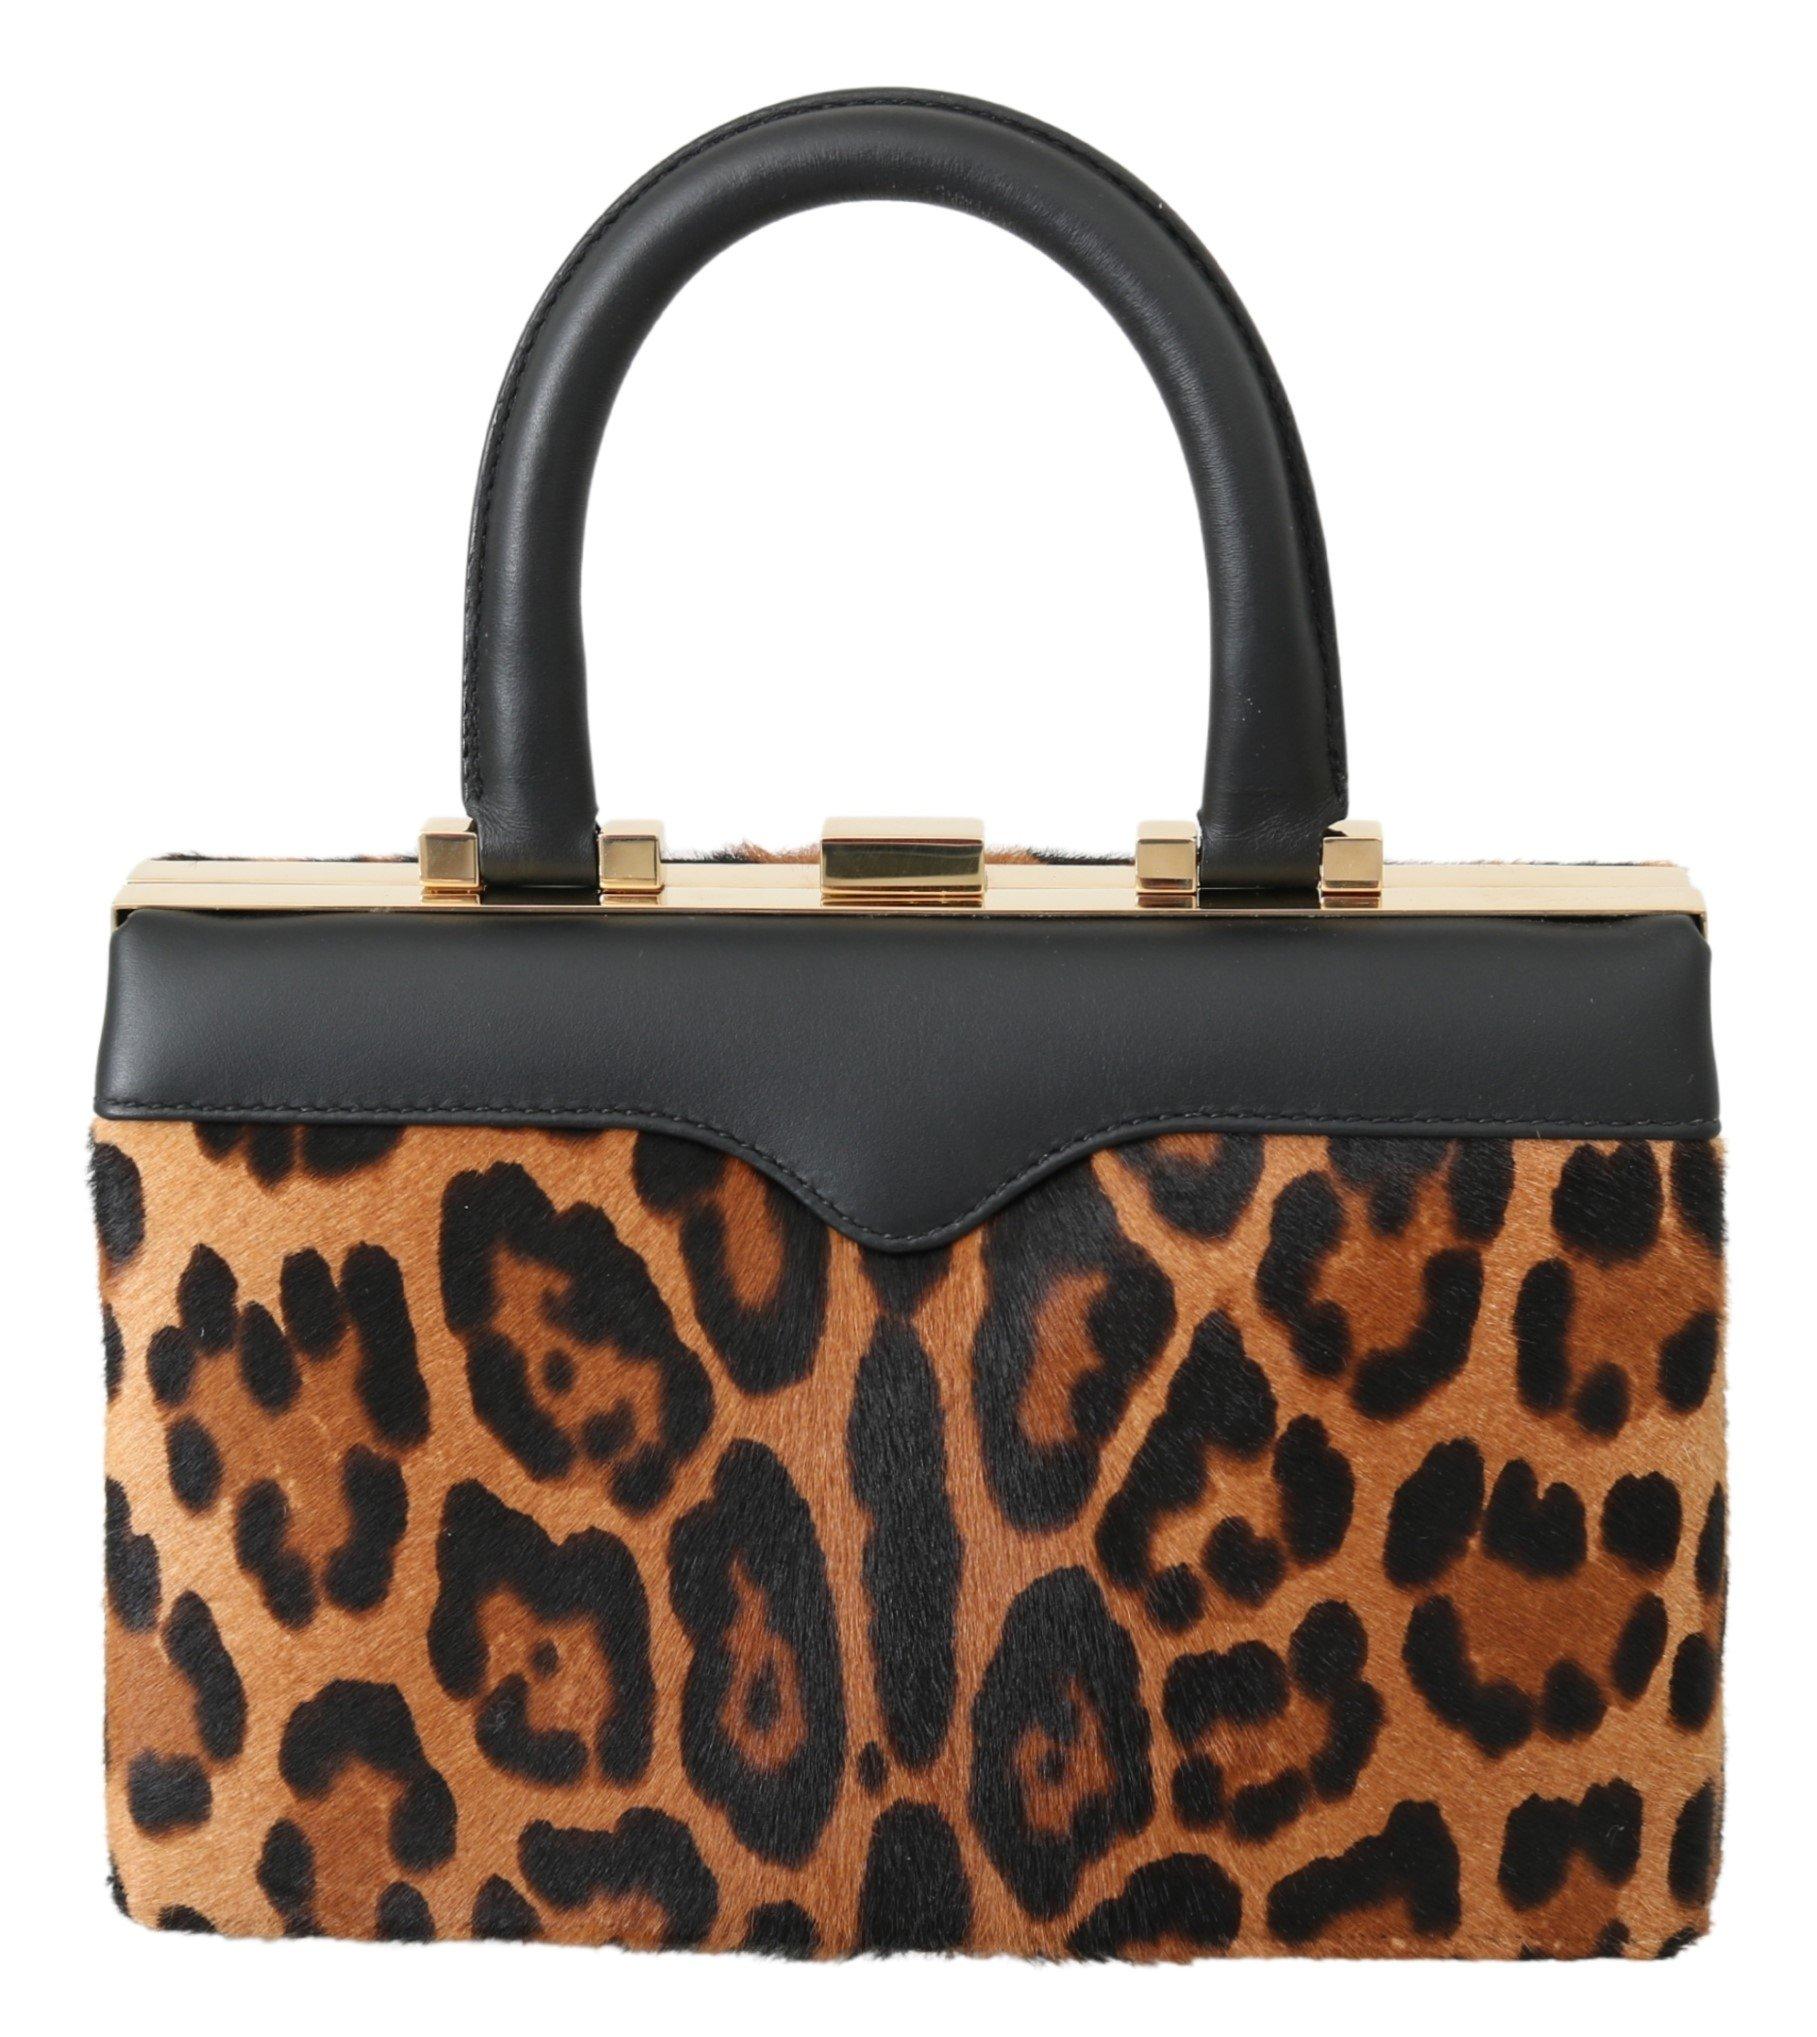 Dolce & Gabbana Women's Leather Leopard Eva Handbag Brown VAS9967